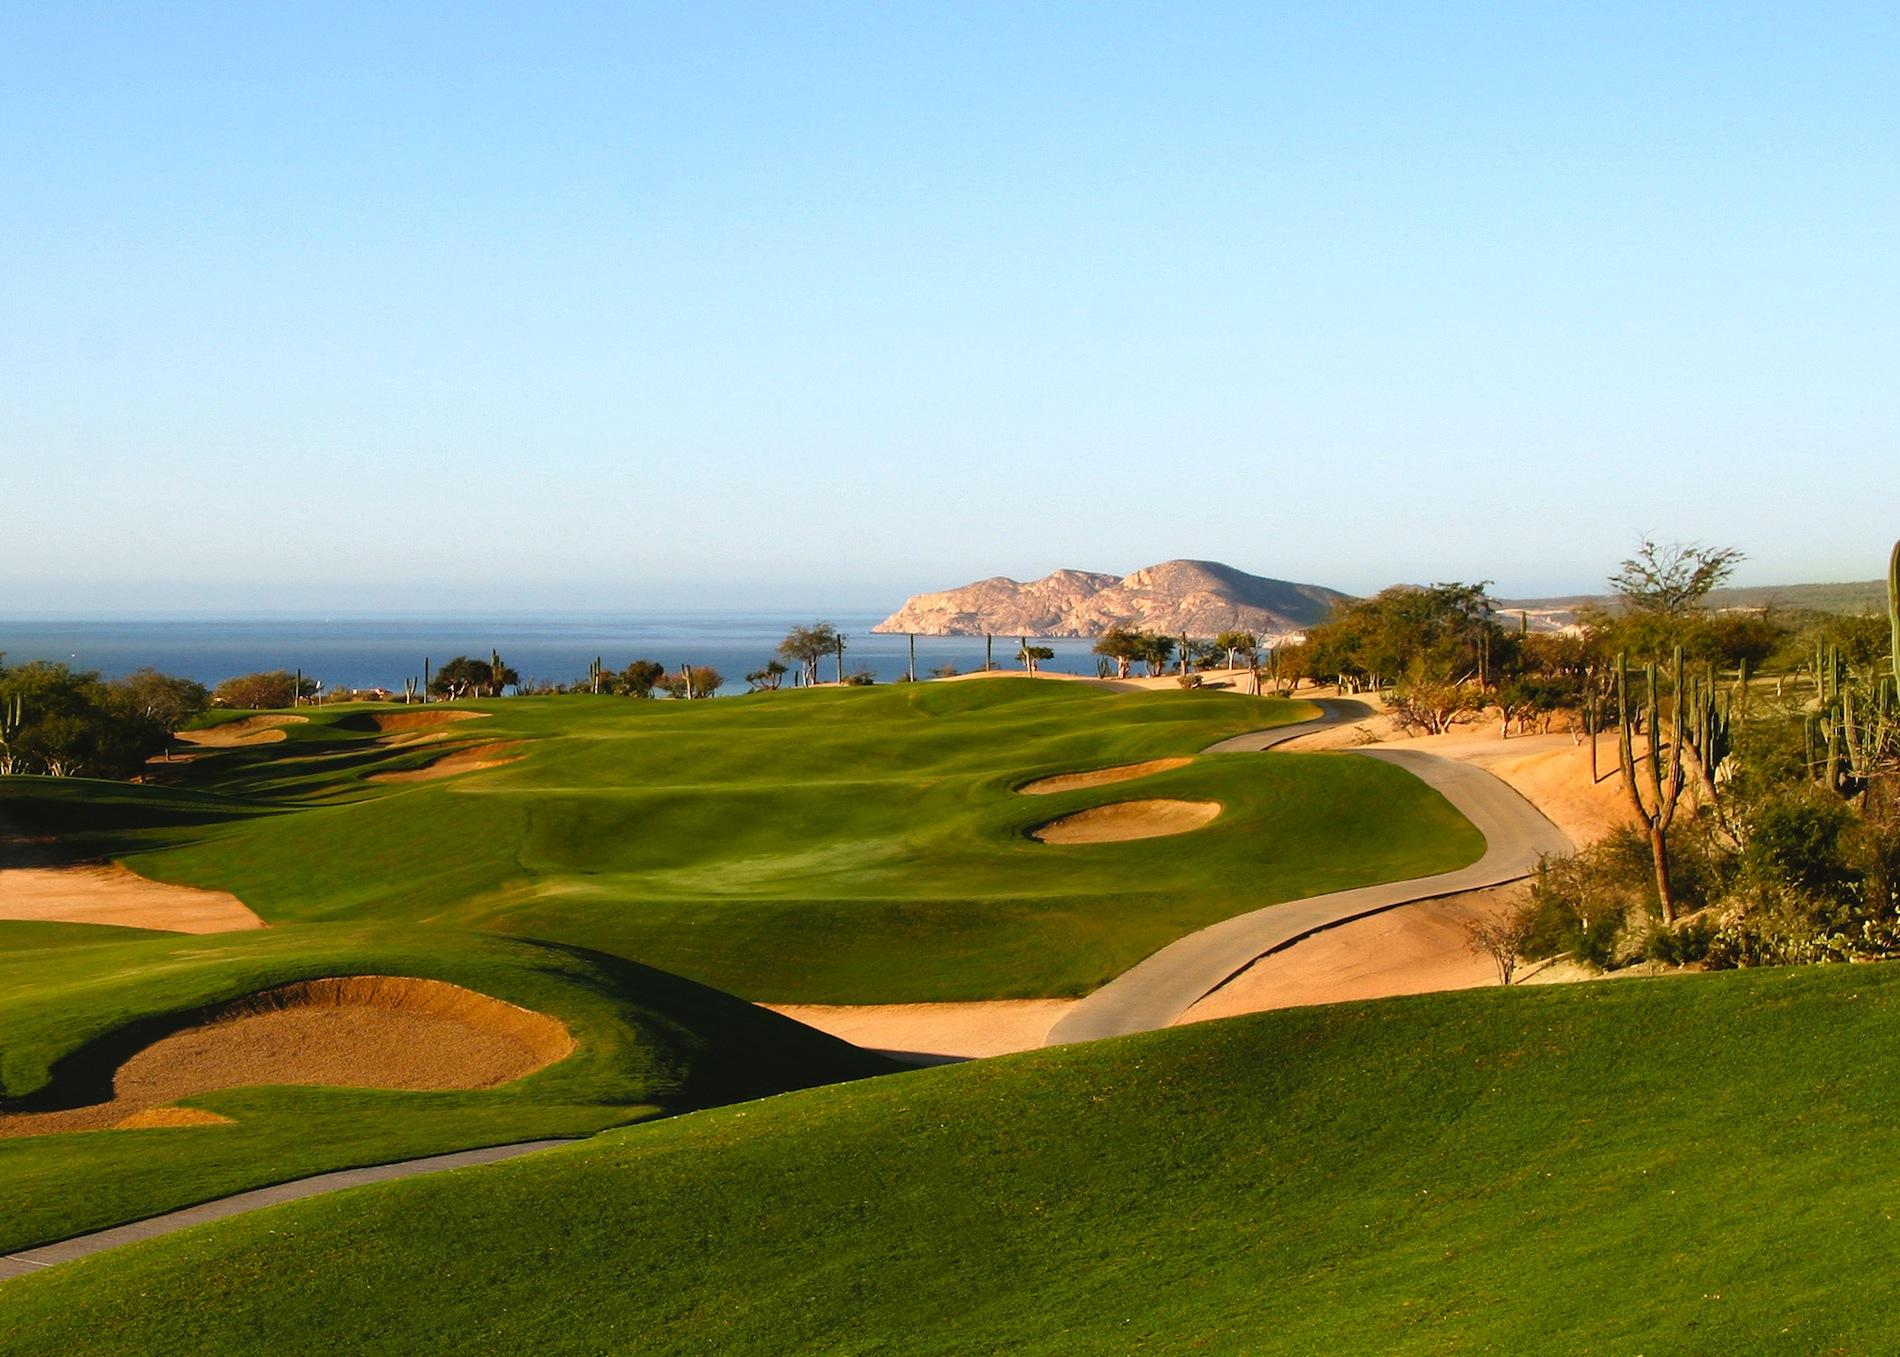 Baja Mexico: A Golfer's Dream